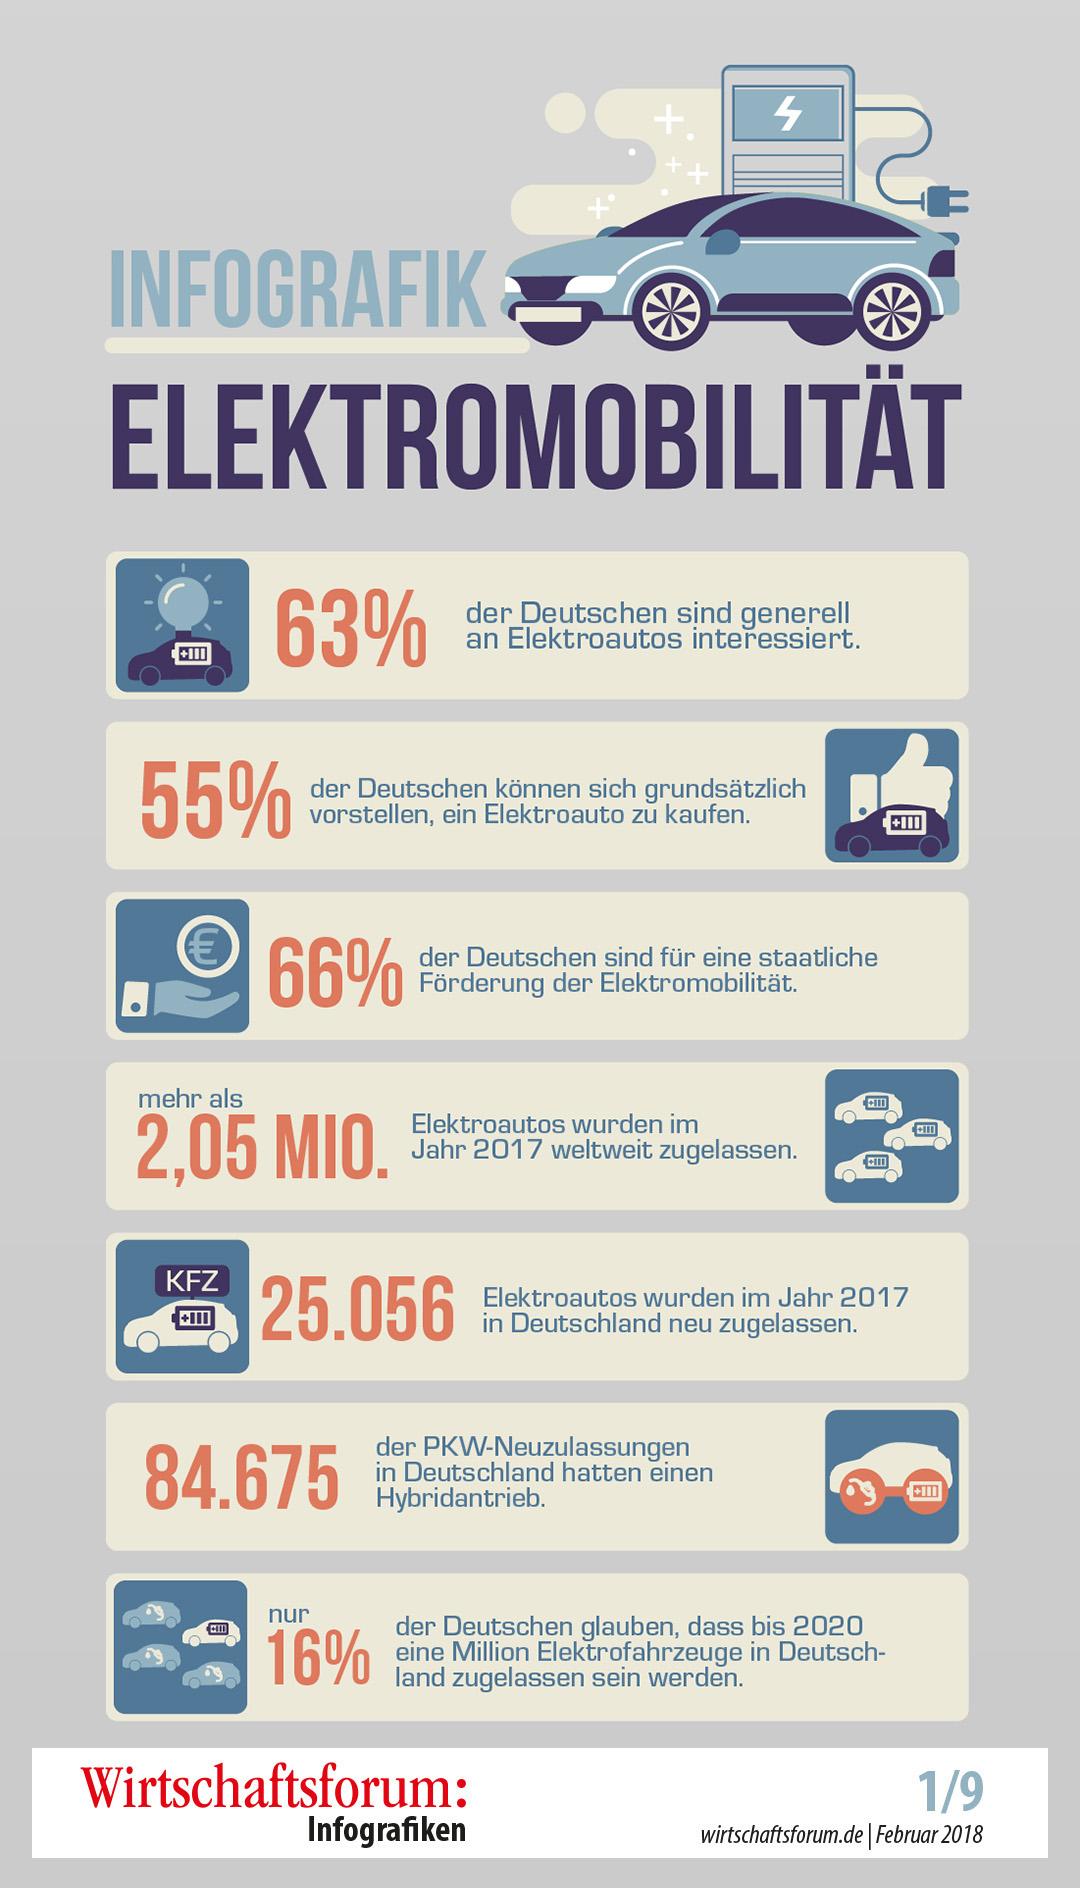 cb0e0429ef1b 02/2018 - Elektromobilität - 02/2018 - Elektromobilität ...